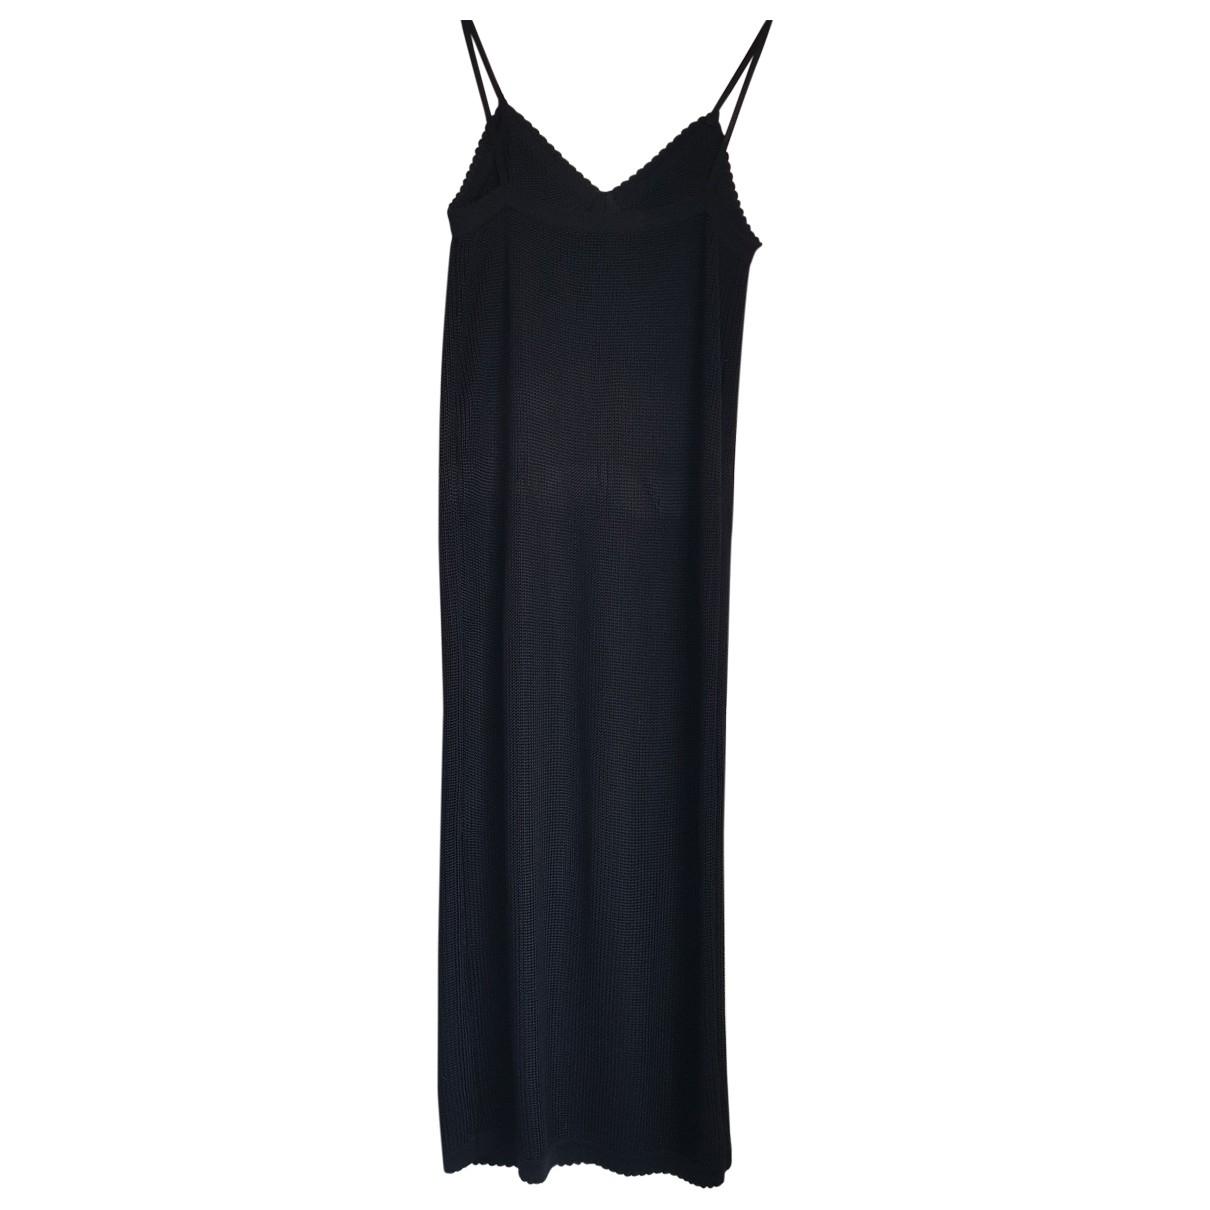 Chantal Thomass - Robe   pour femme en soie - noir